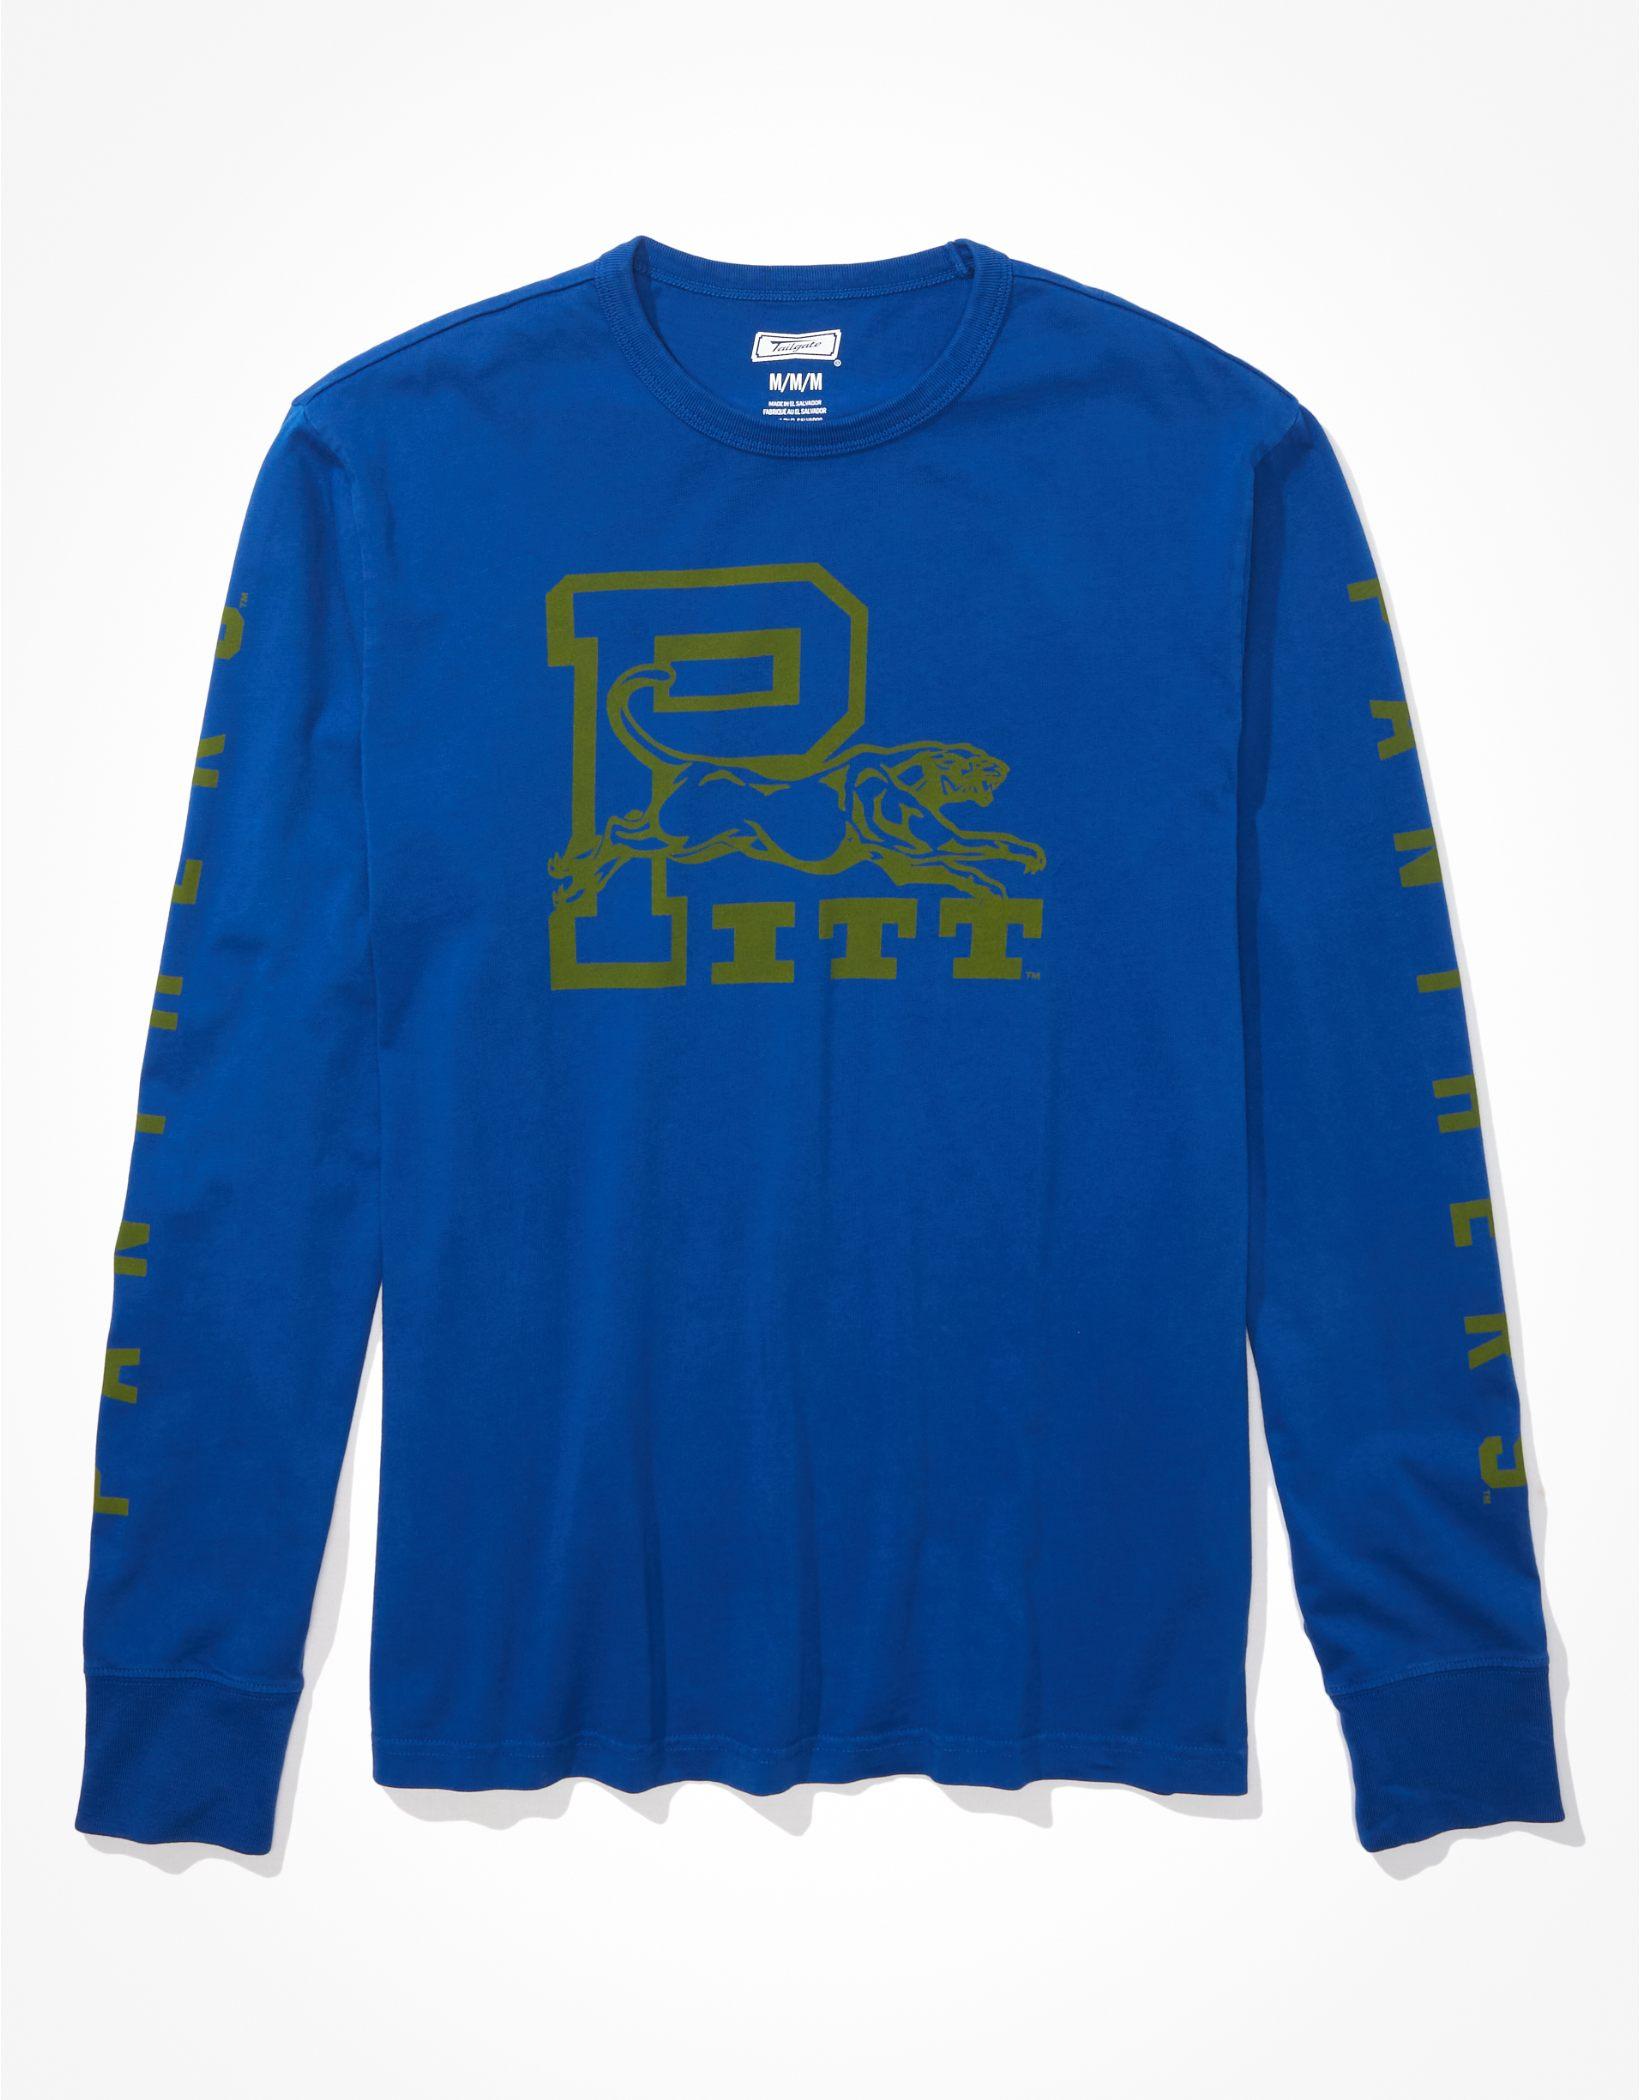 Tailgate Men's Pitt Panthers Long-Sleeve Graphic T-Shirt